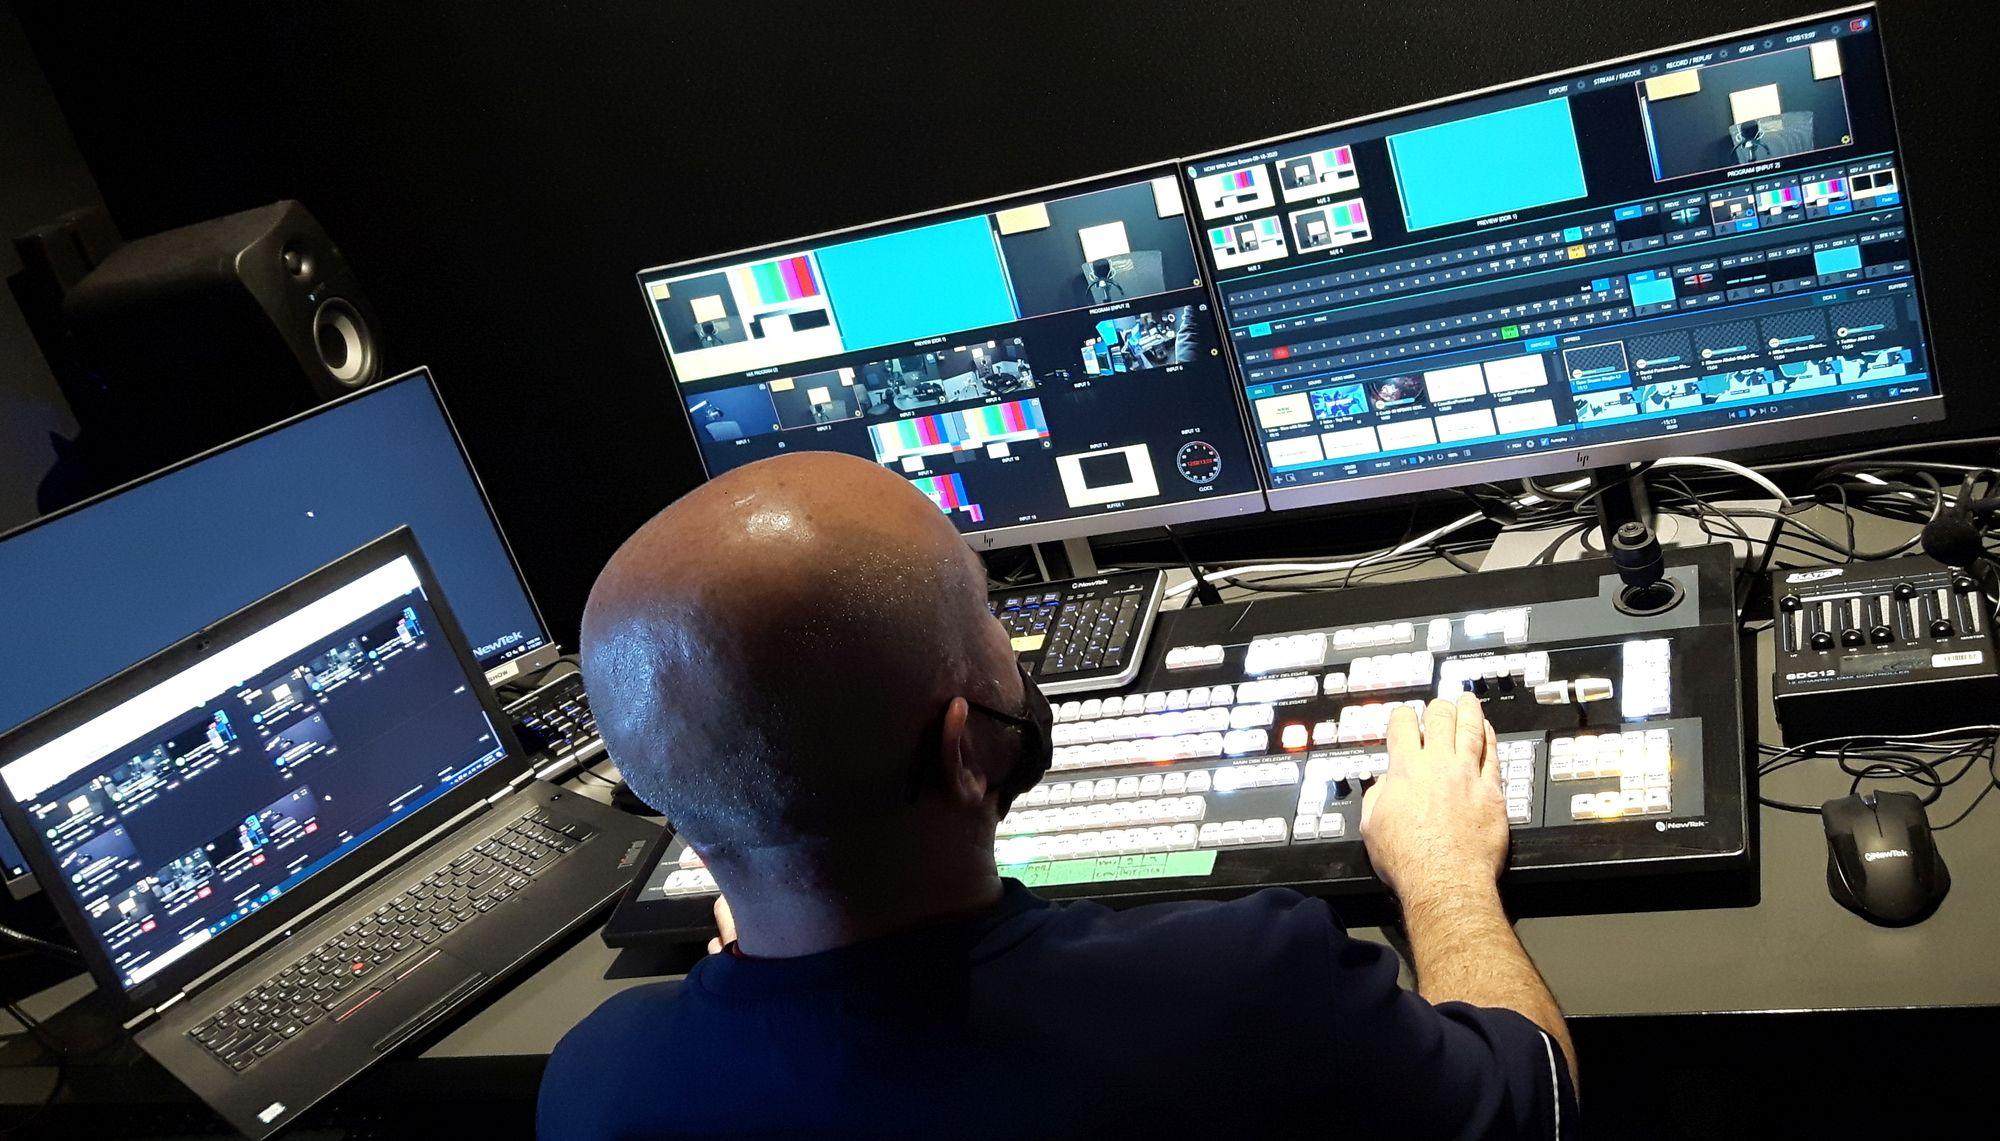 Accessible Media Inc. (AMI) deploys VT for remote multi-camera production